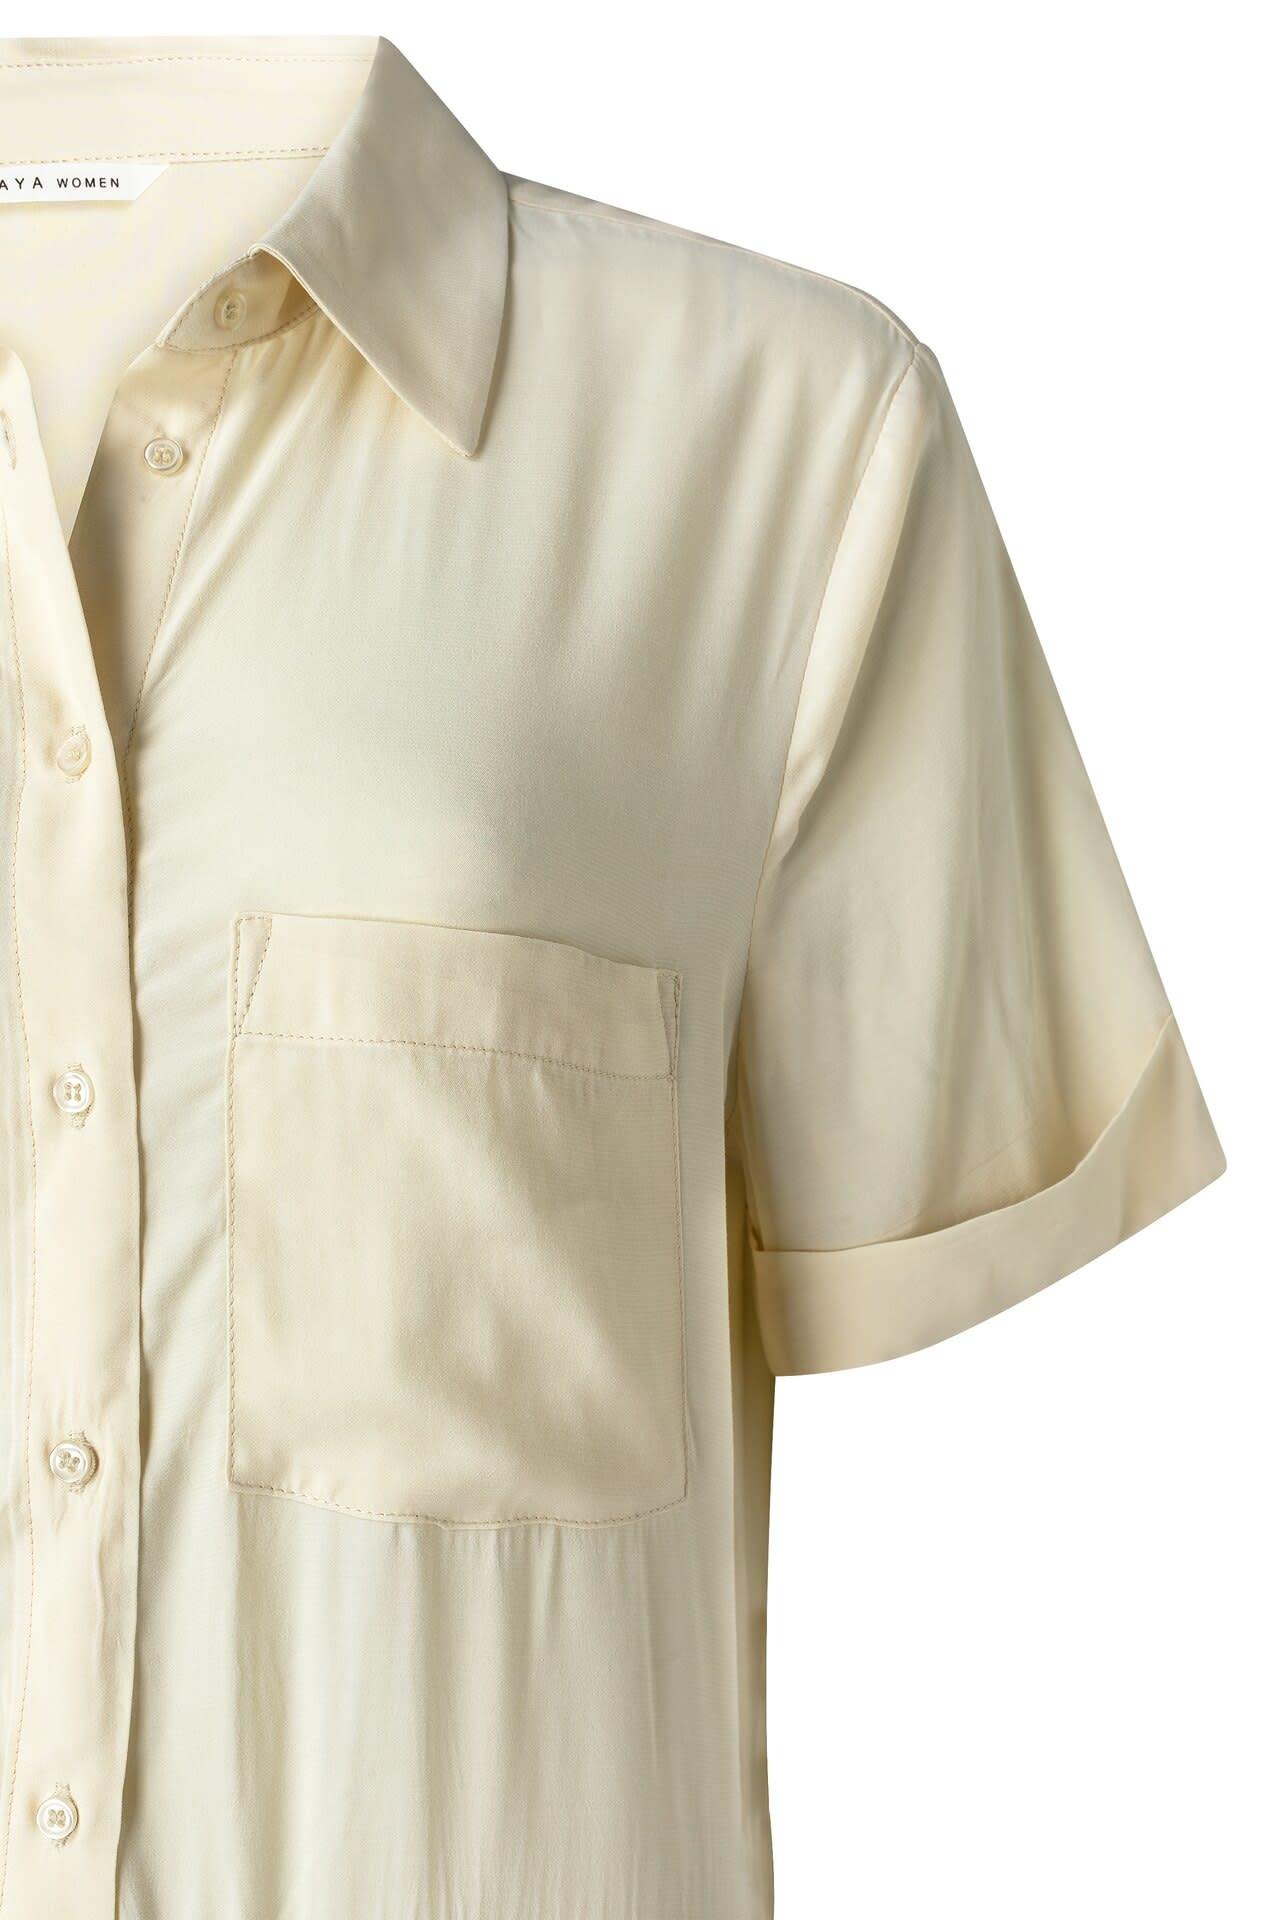 YAYA Women Button down maxi dress